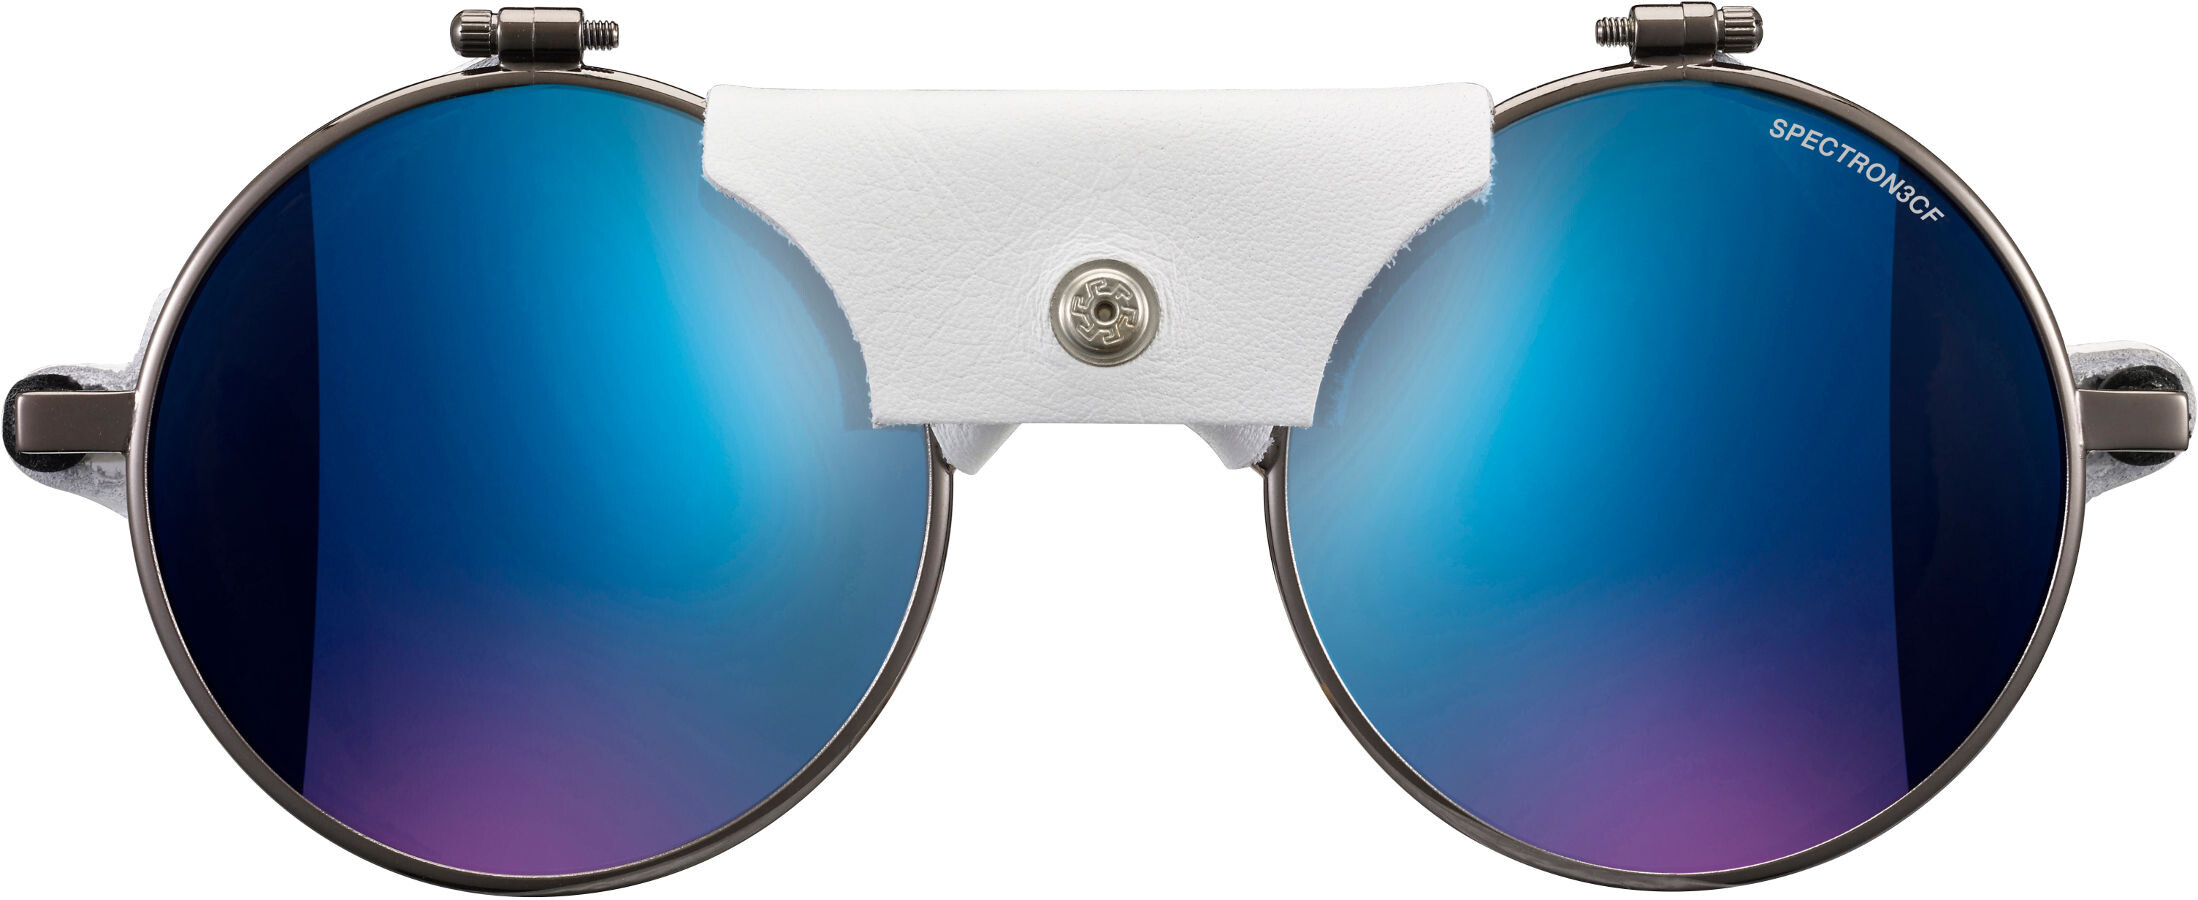 Julbo Vermont Classic Spectron 3CF - Lunettes - bleu blanc sur CAMPZ ! 518b96fbdac7